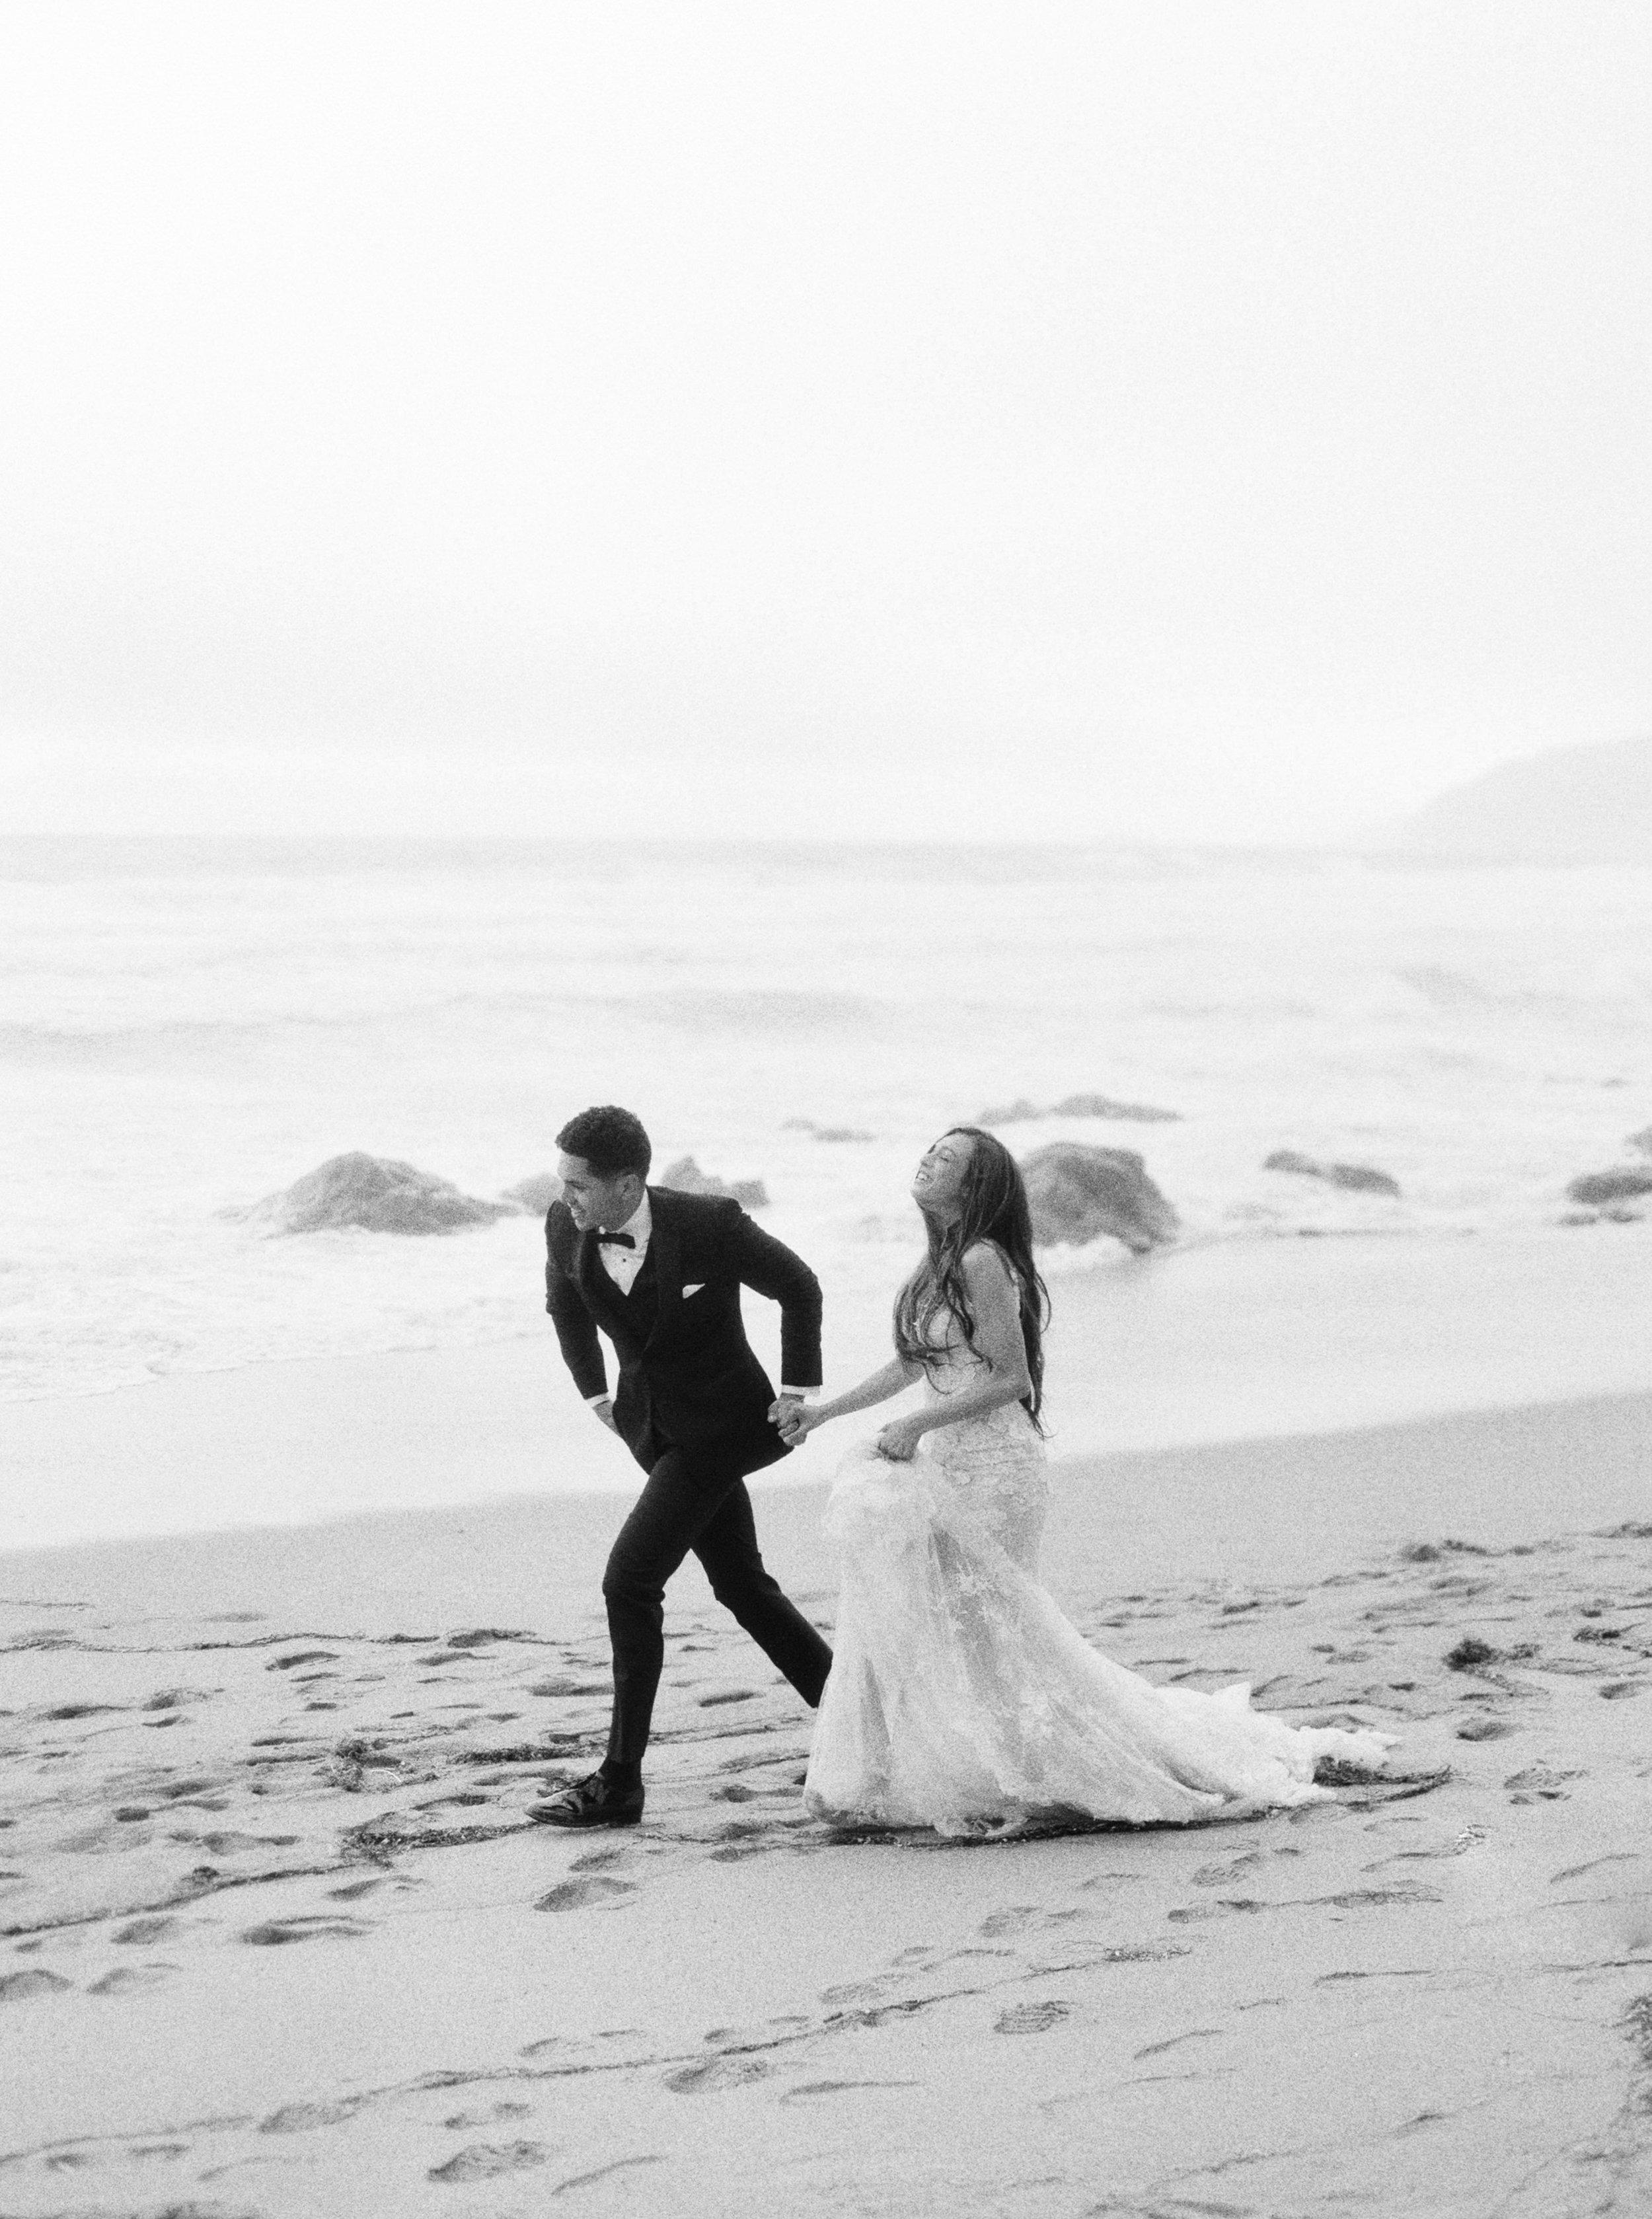 Santa-Barbara-Film-Wedding-Photography-San-Luis-Obispo-Ashley-Rae-Studio111.jpg